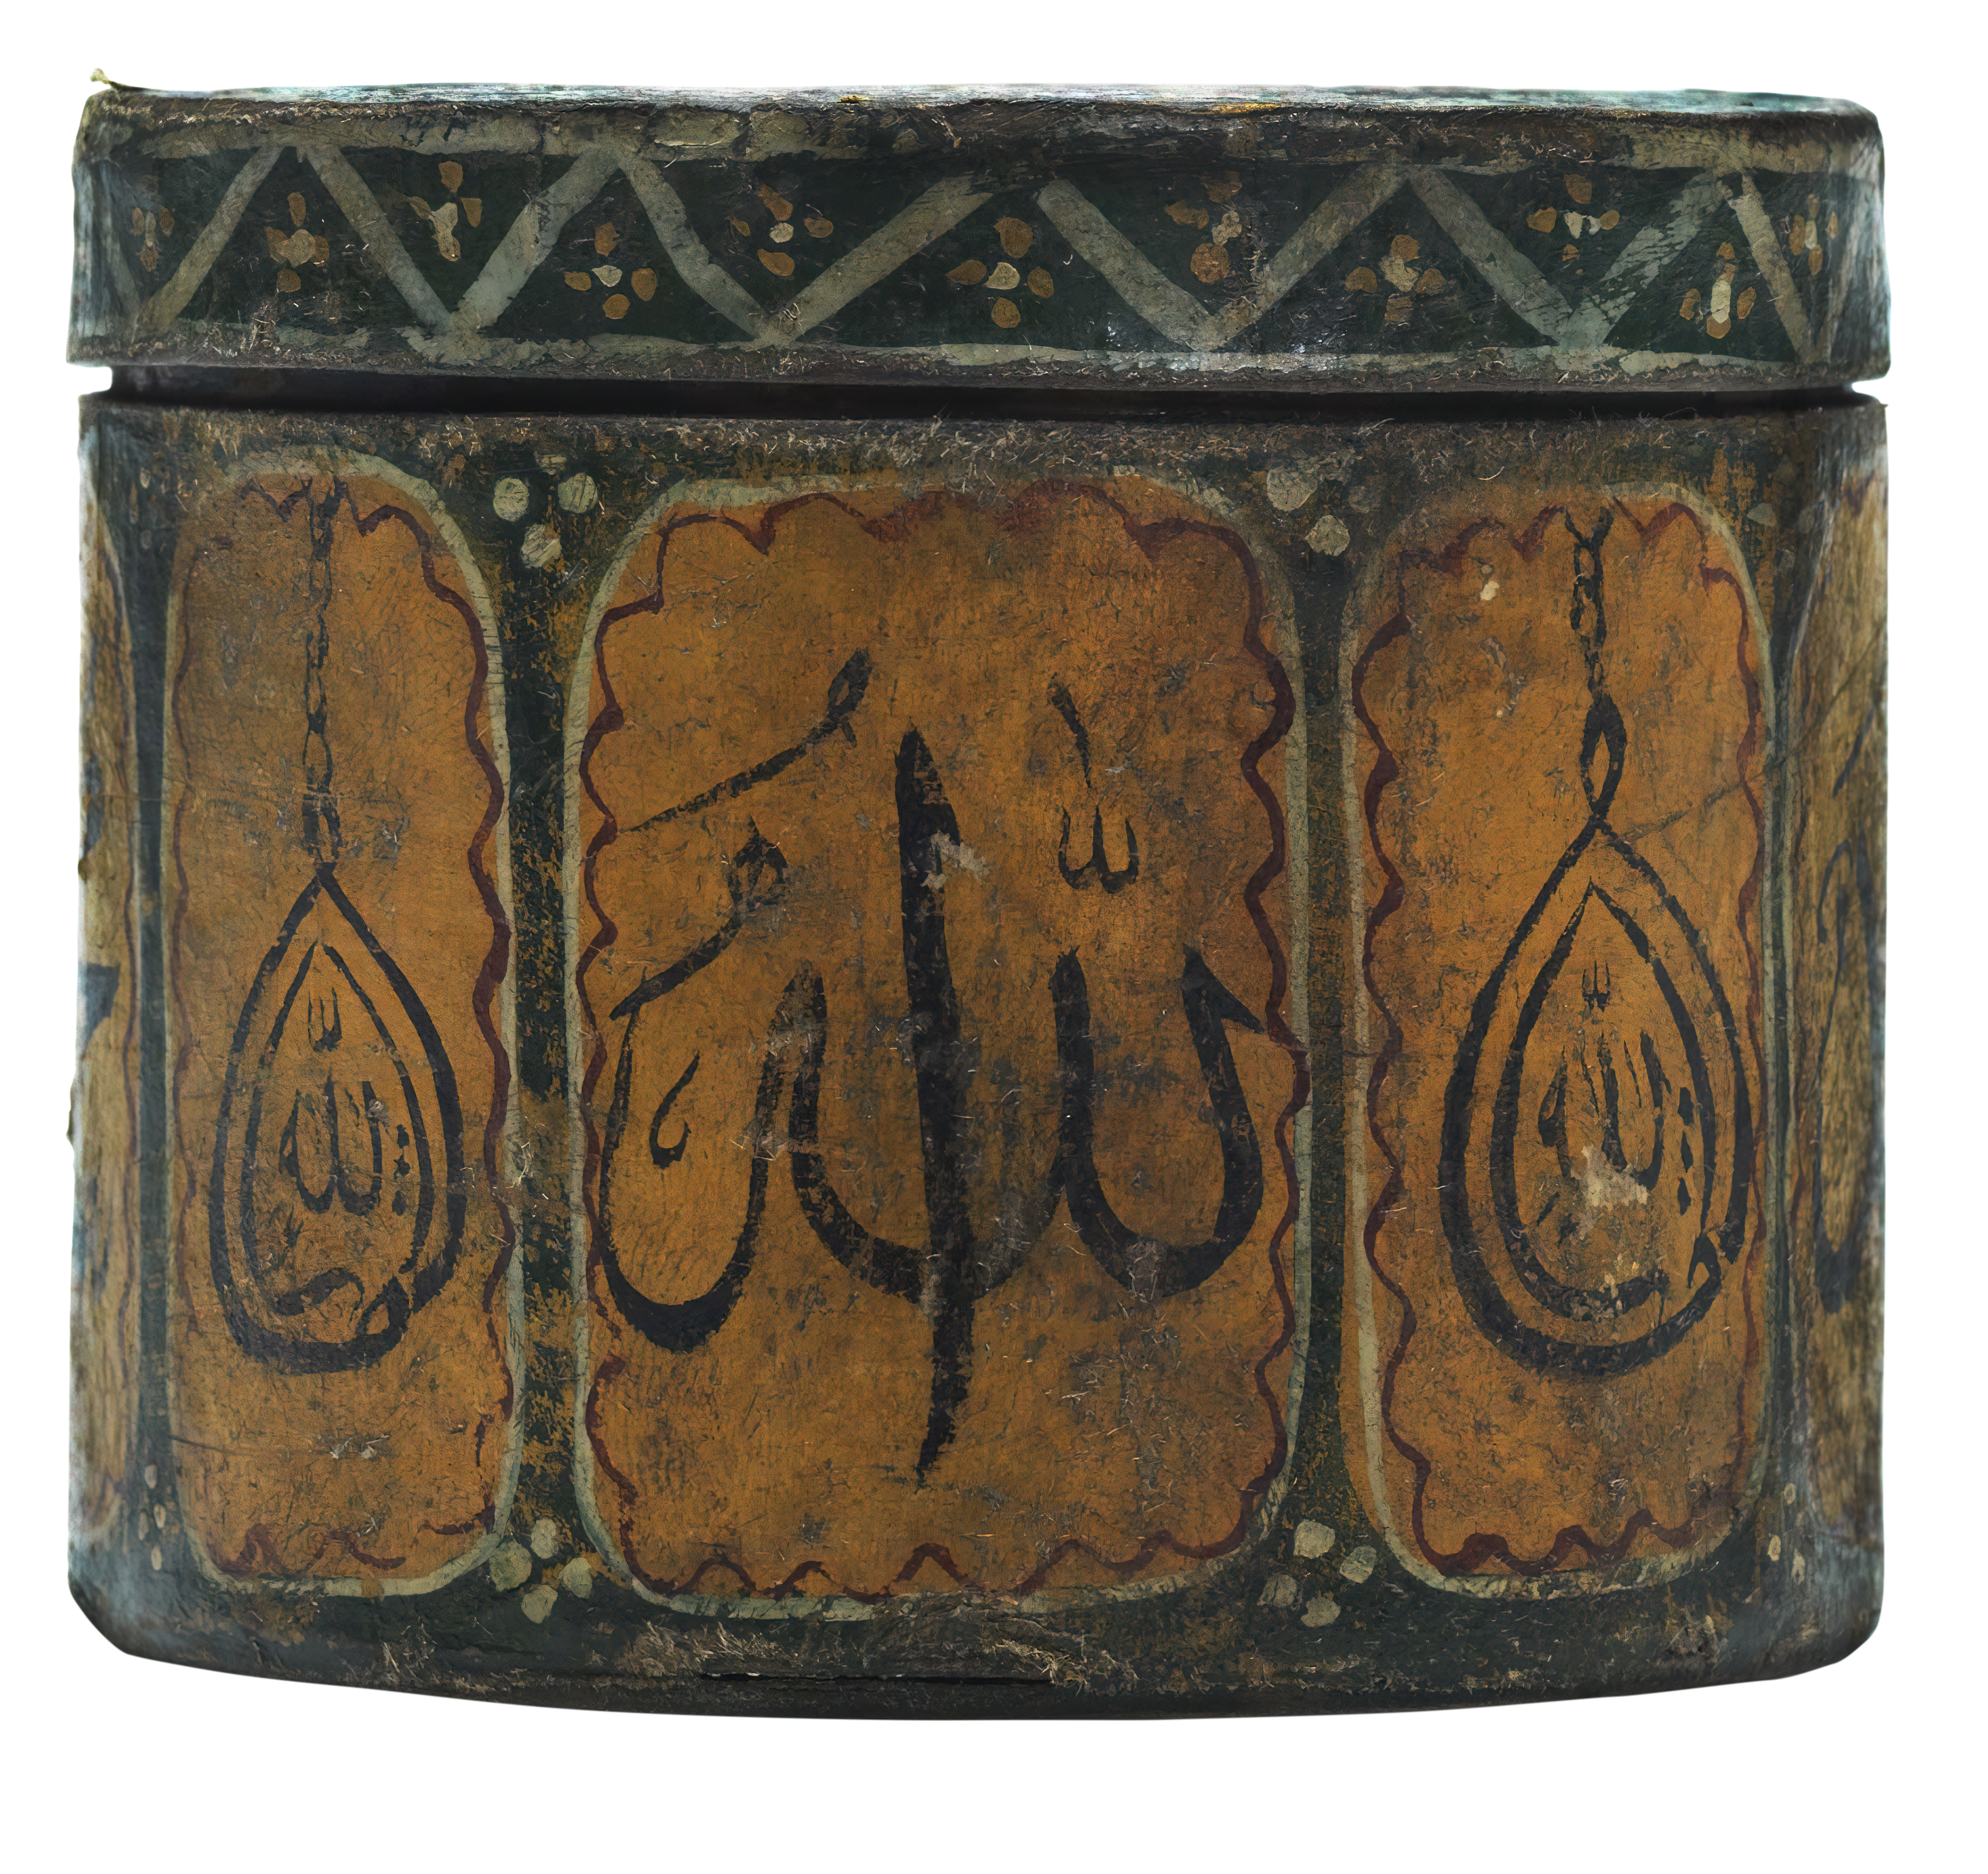 Qiblah compass